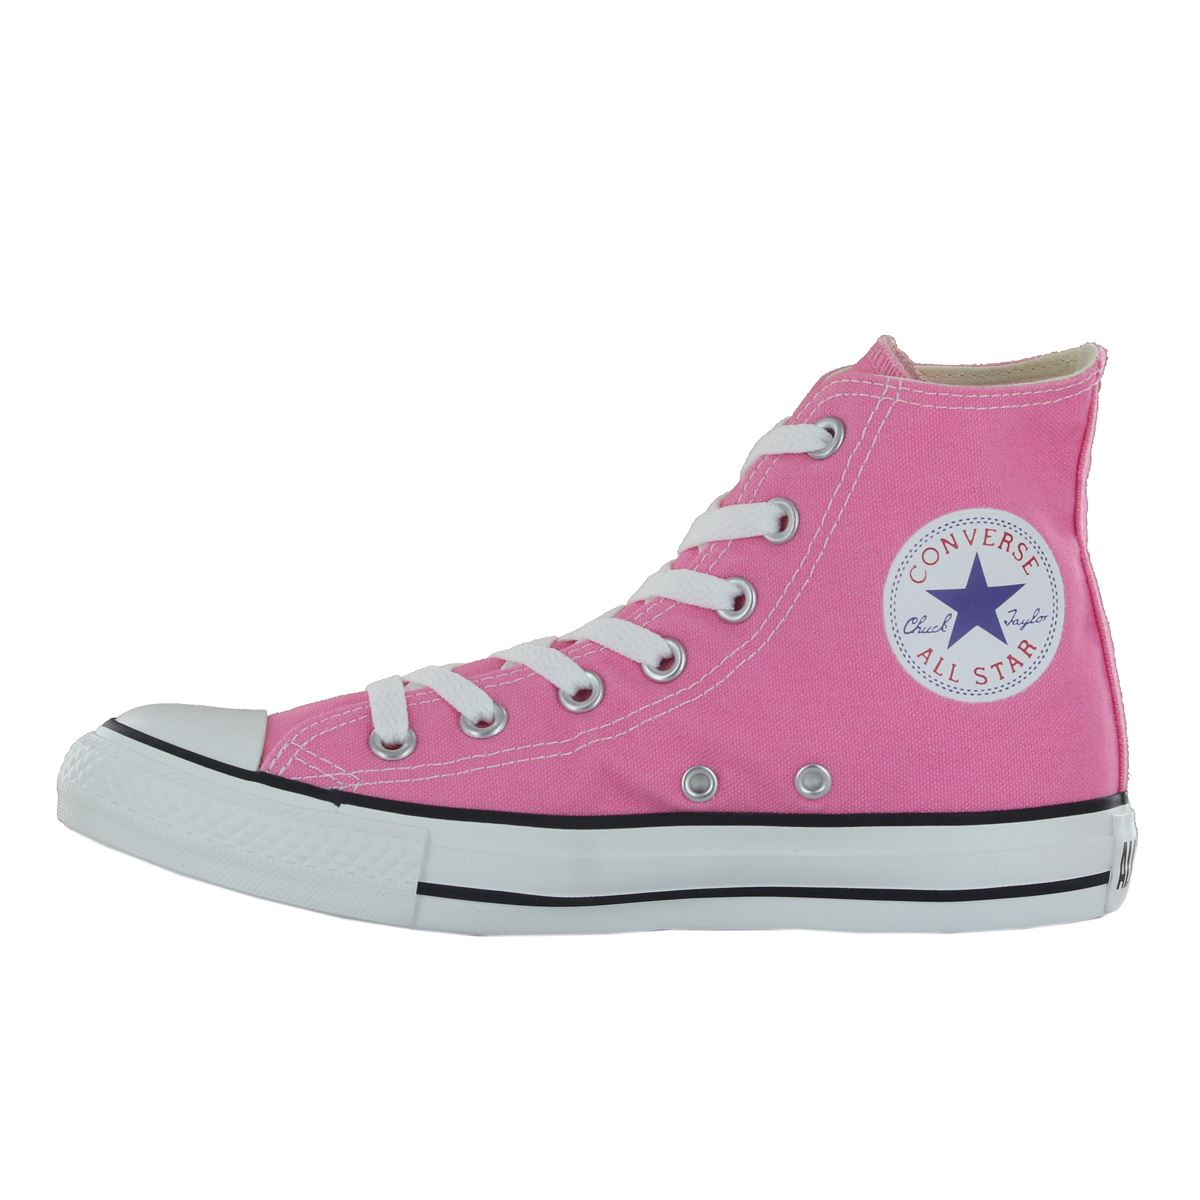 Converse-Chuck-Taylor-All-Star-Hi-Canvas-Mens-Womens-Ladies-Unisex-Trainers miniatuur 25